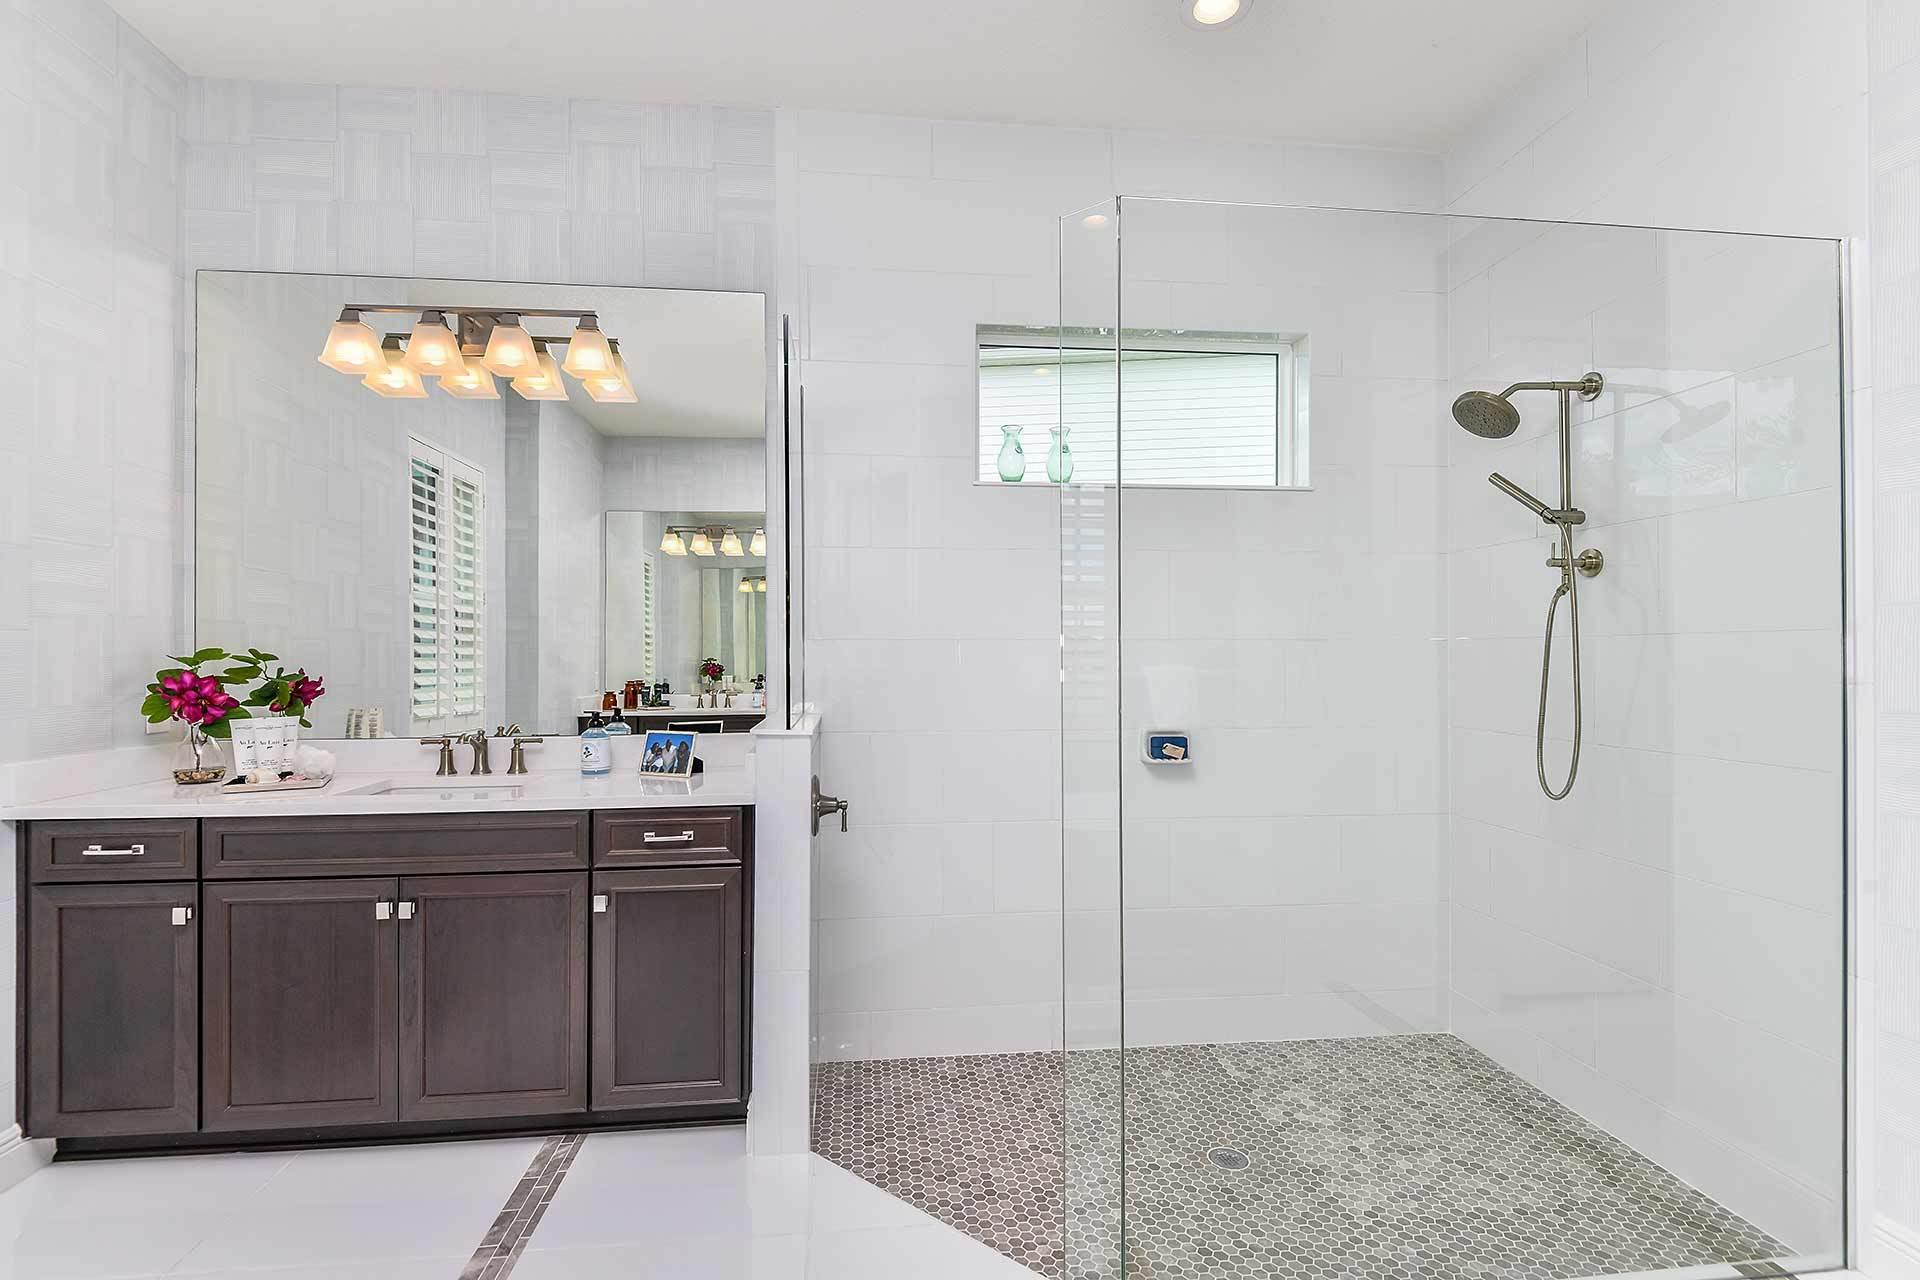 Bathroom featured in the Savannah 2 By Neal Communities in Sarasota-Bradenton, FL